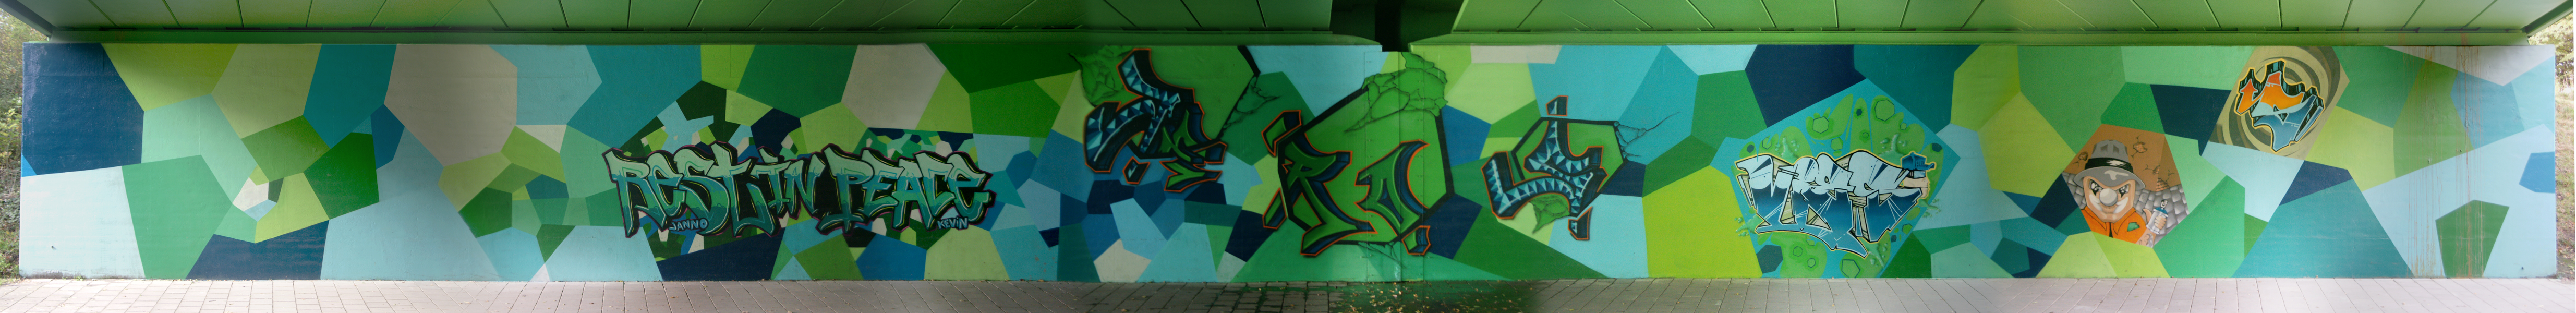 Graffiti Memorial